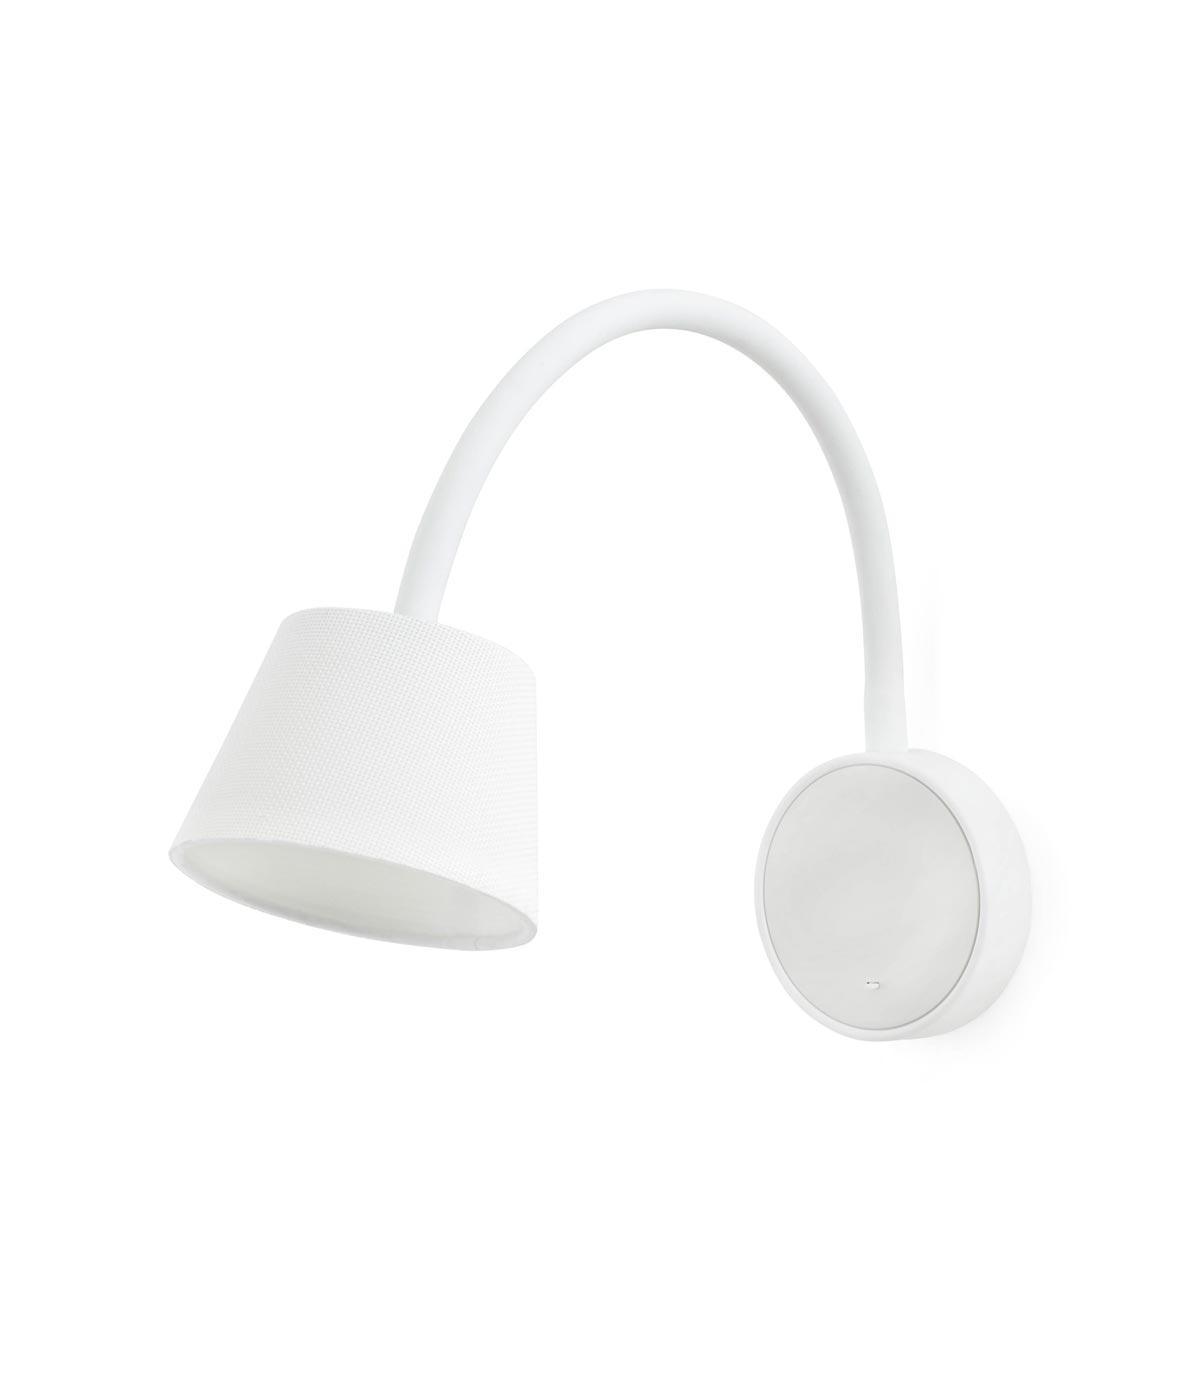 Lámpara aplique flexible blanca BLOME LED